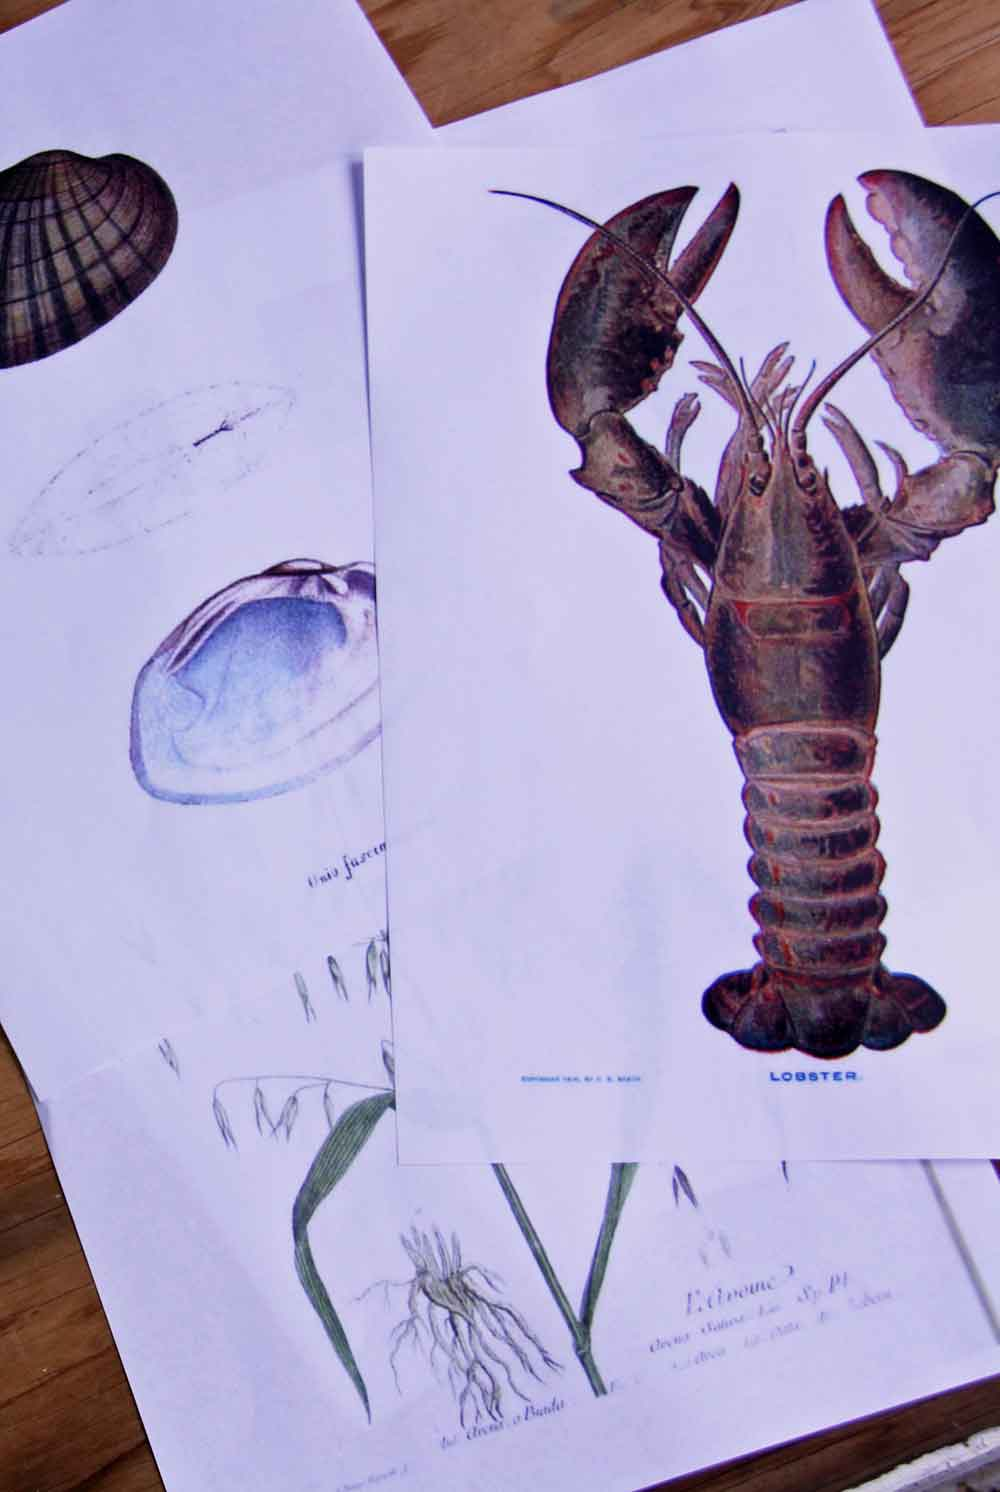 Vintage lobster scientific print | redleafstyle.com